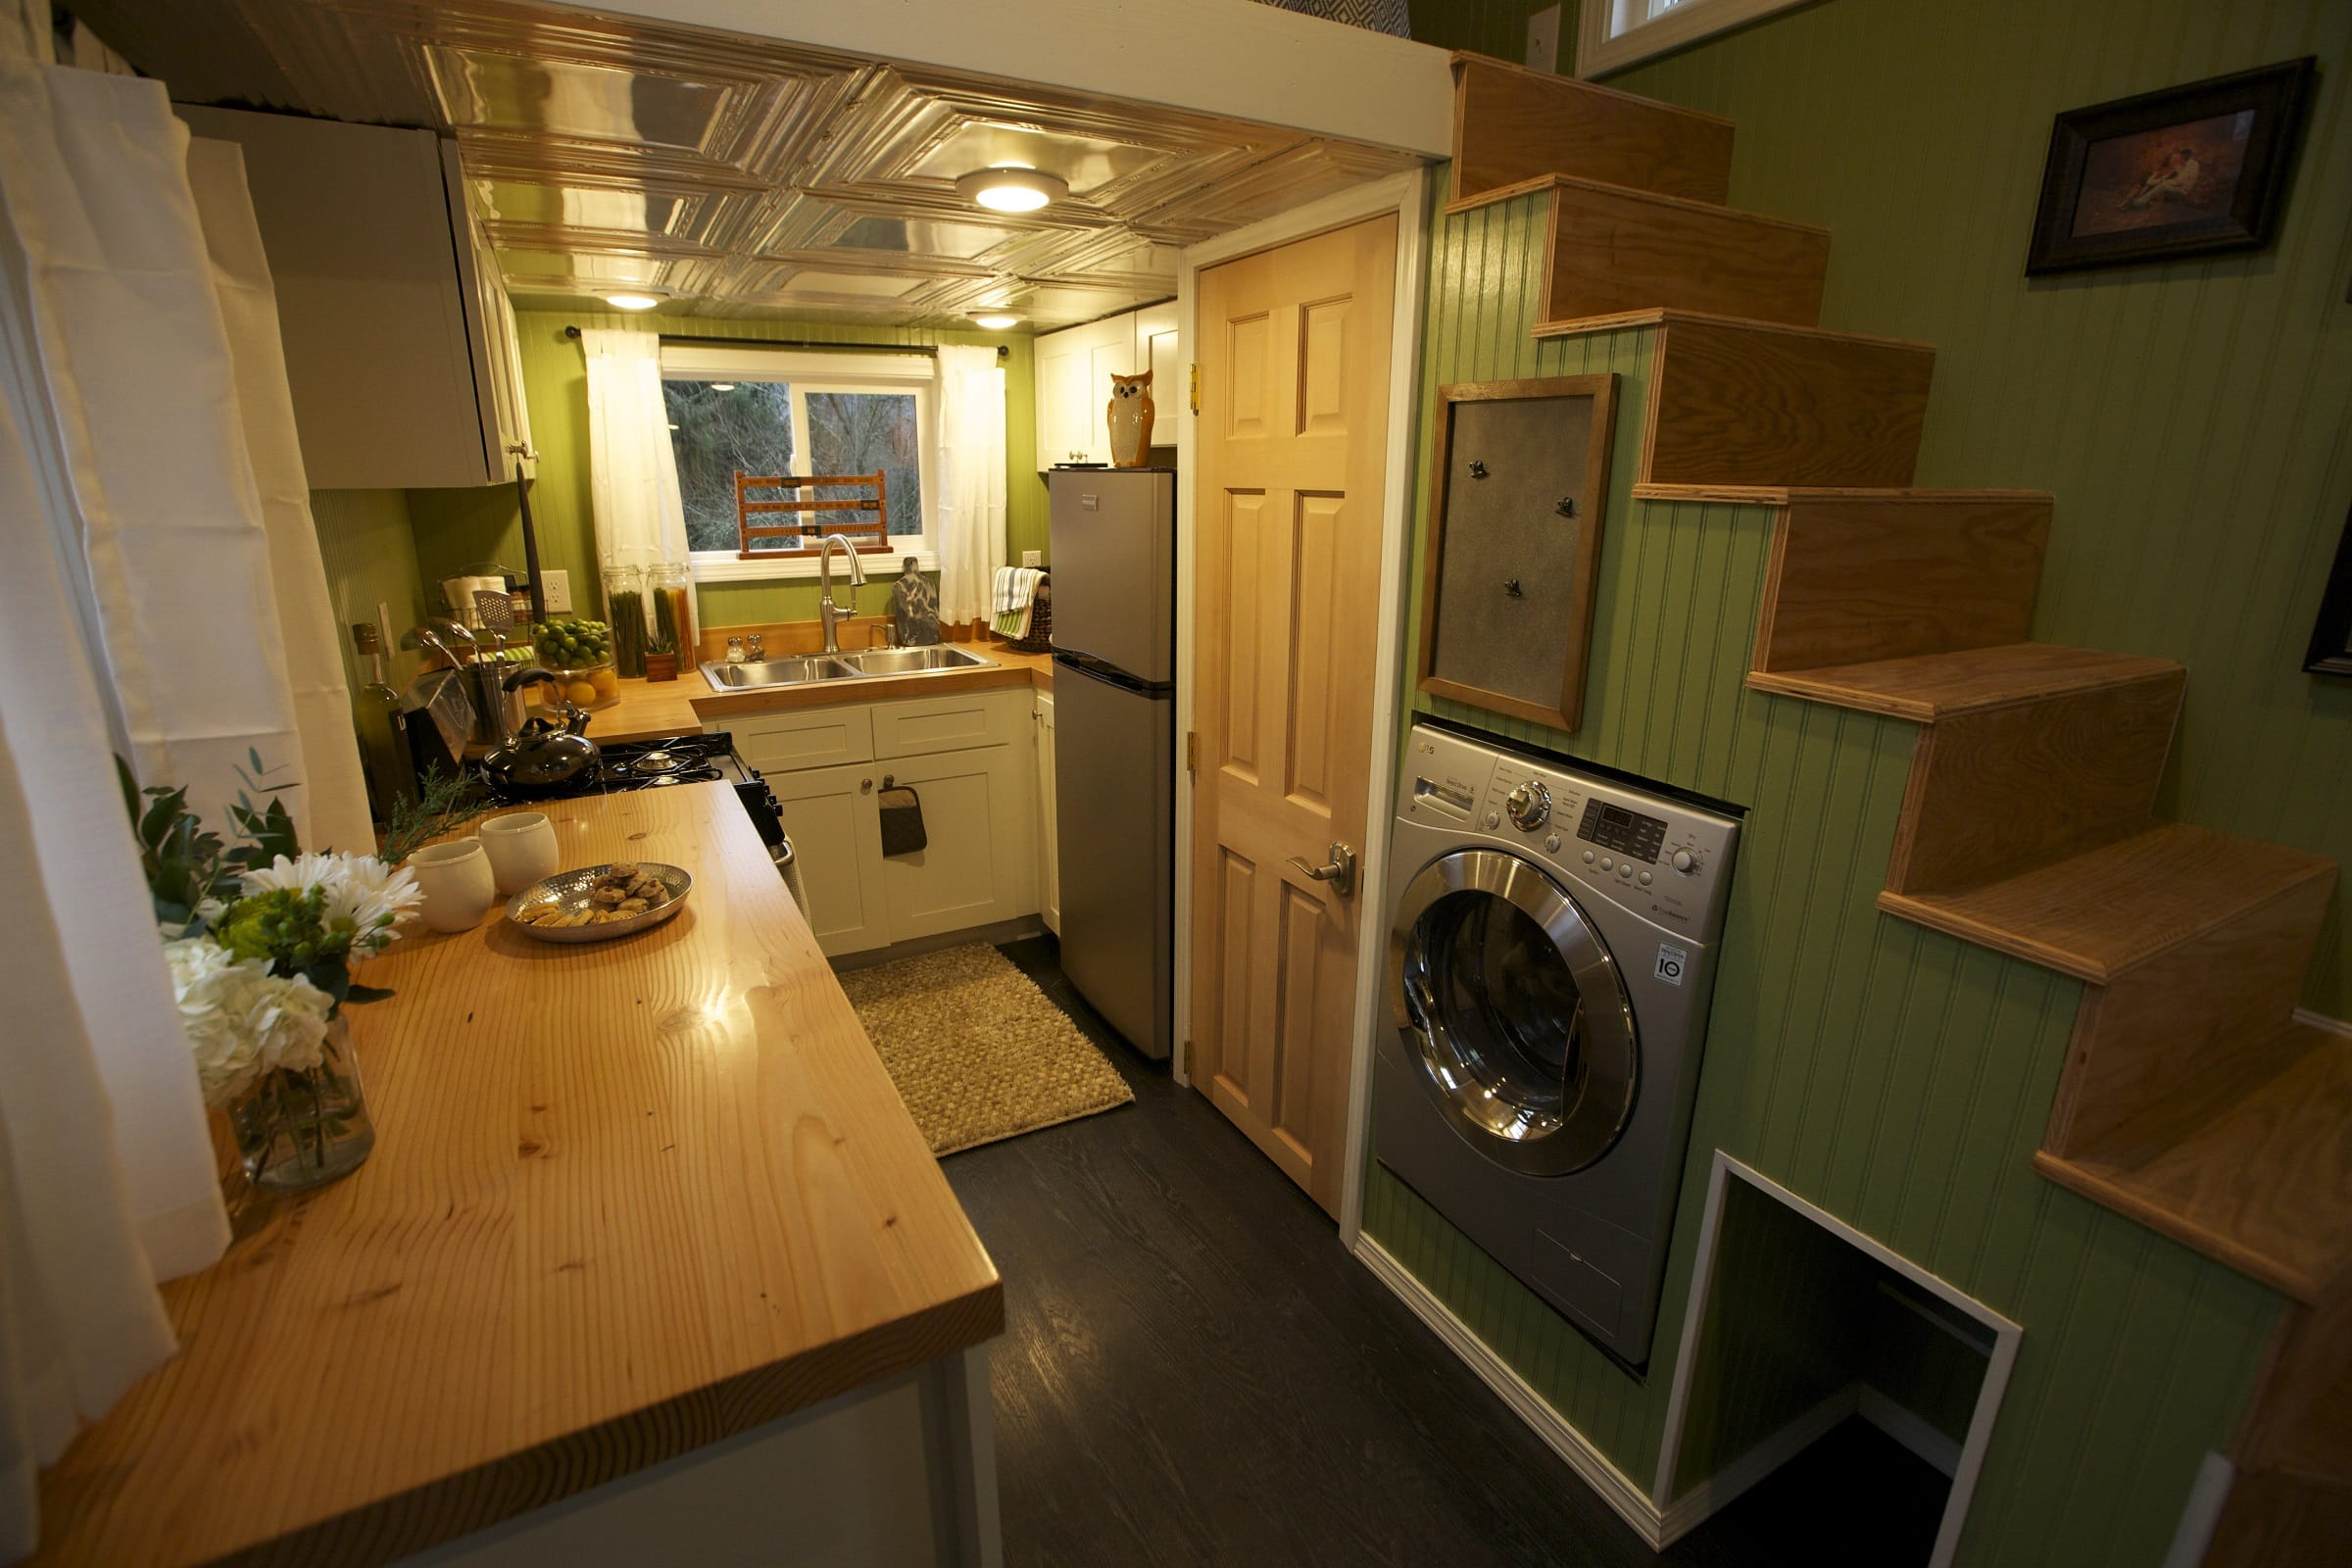 Kitchen-Tiny-Interior-AmericanTinyHouse-HQ